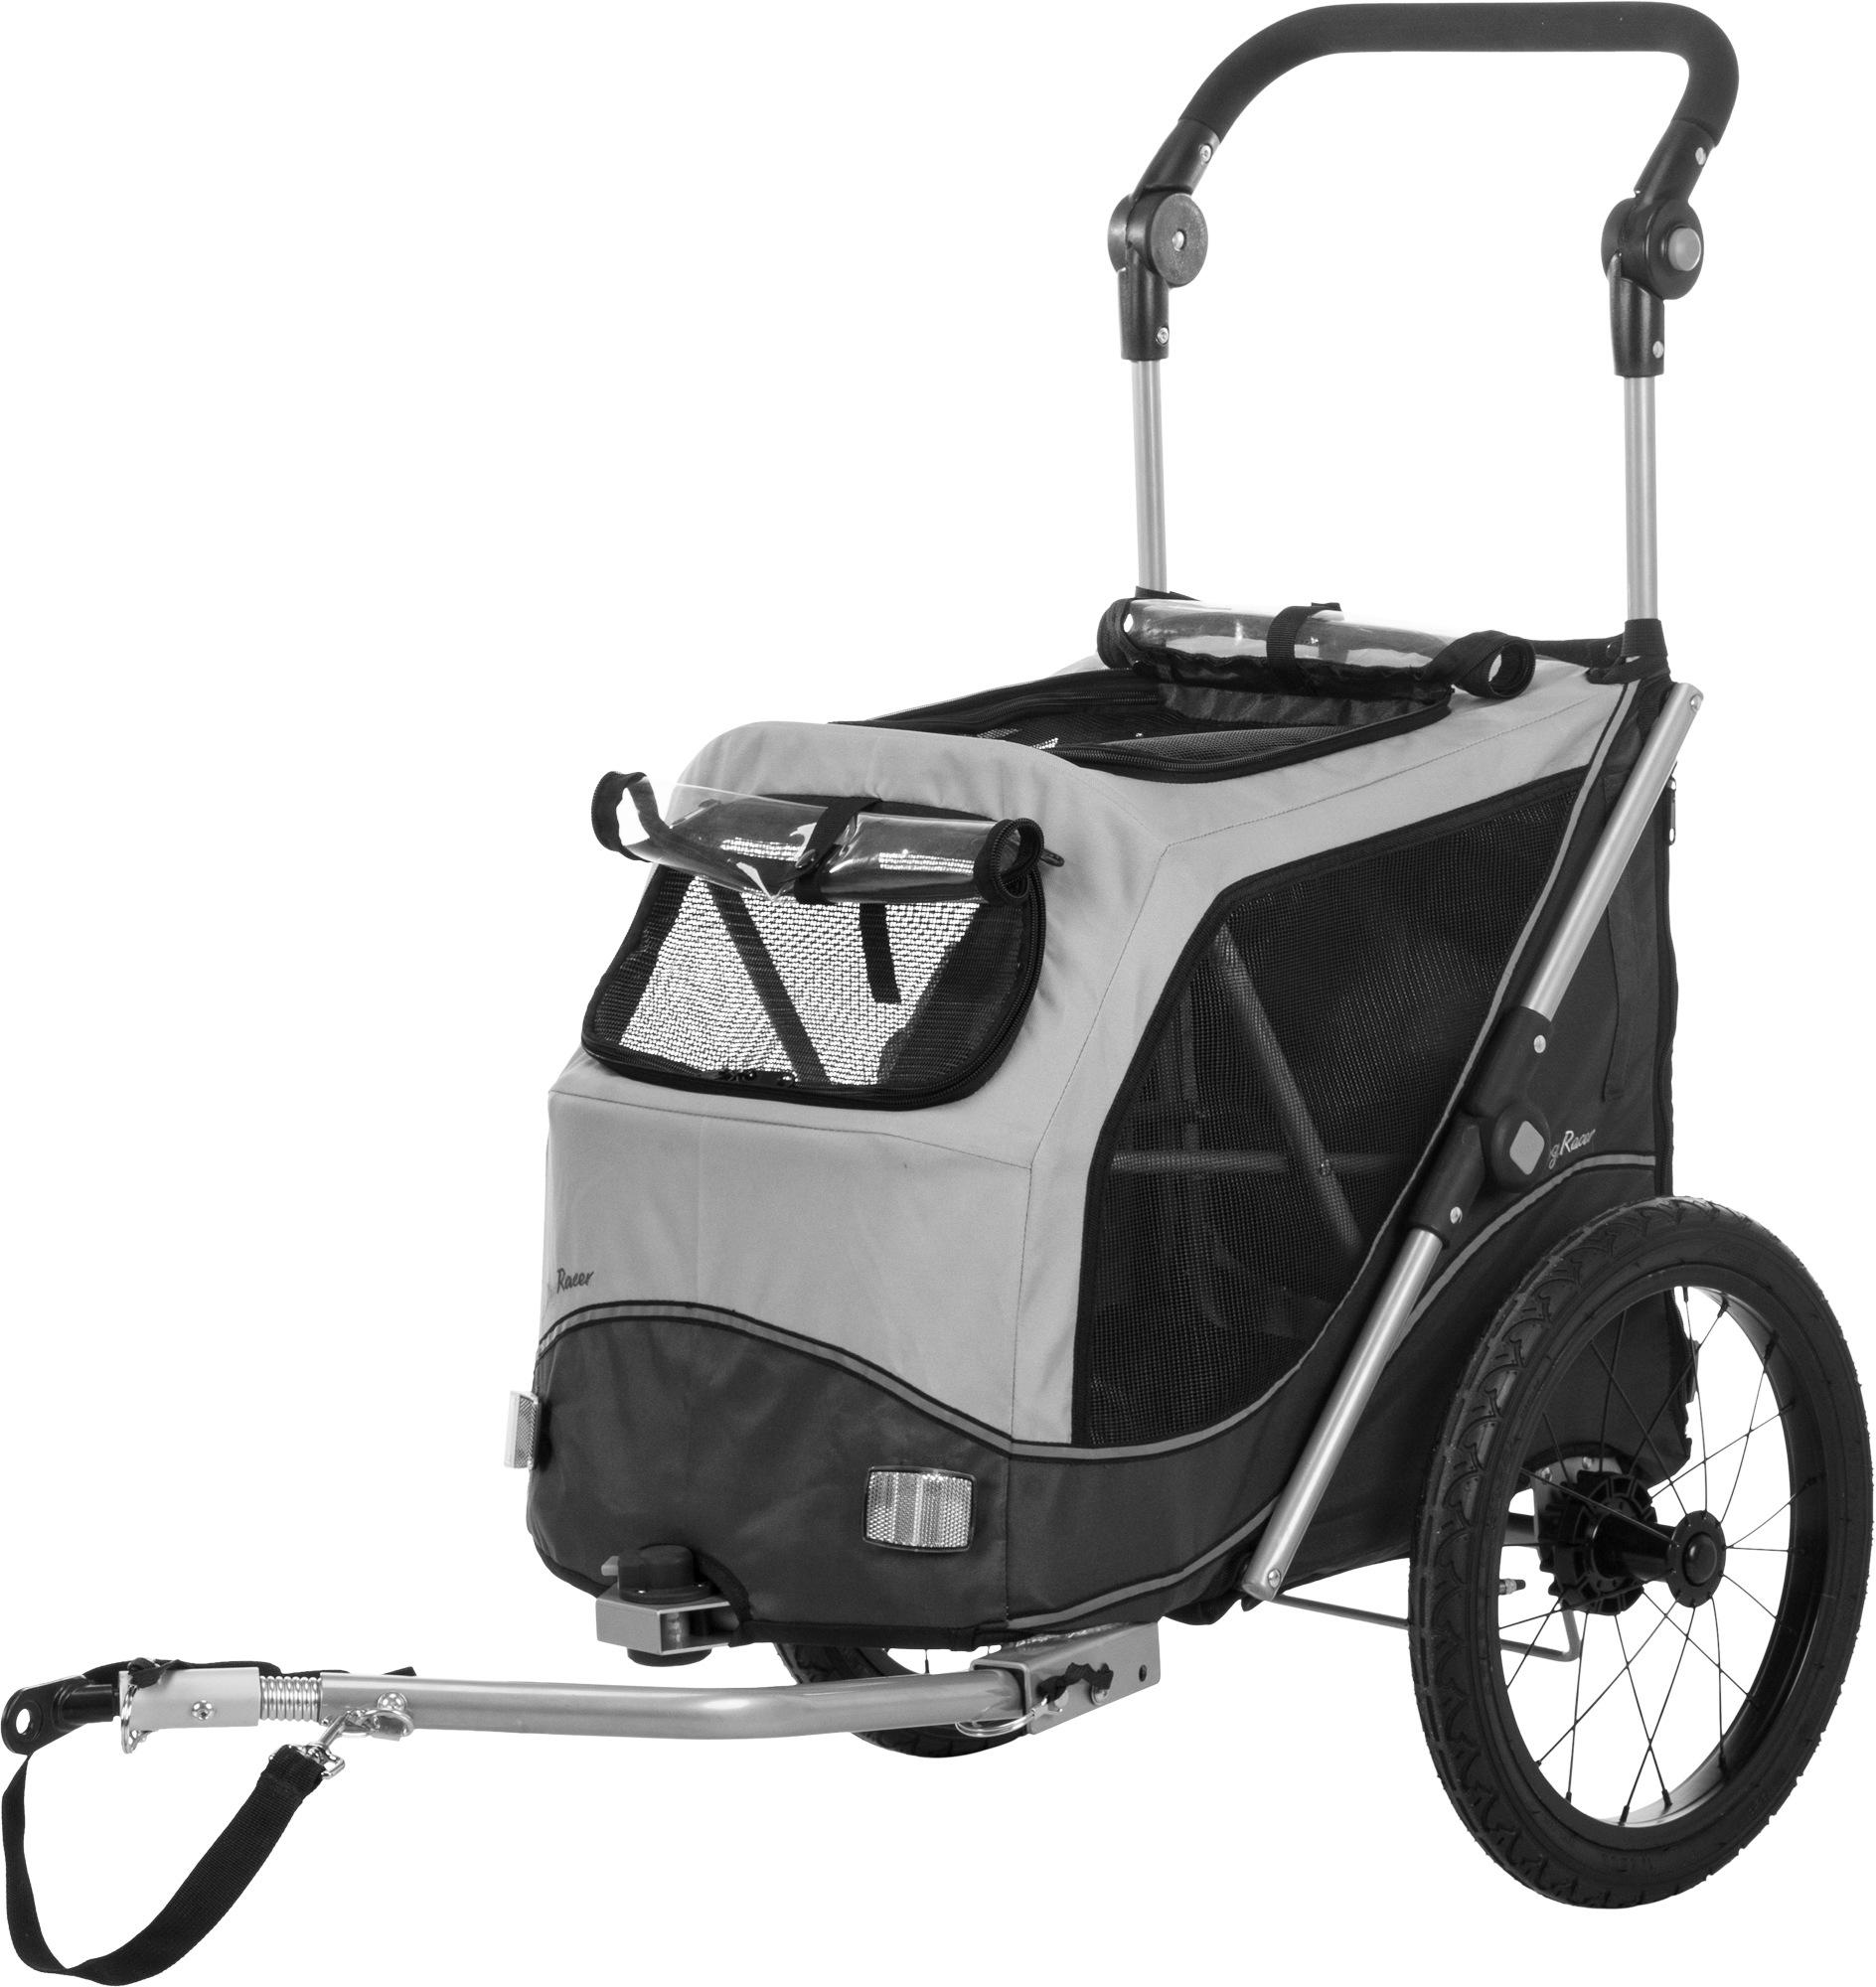 TRIXIE Fahrrad-Anhänger, faltbar TRIXIE Fahrrad-Anhänger, Schnell-Falt-Funktion, L: 74 × 95 × 103/143 cm, grau